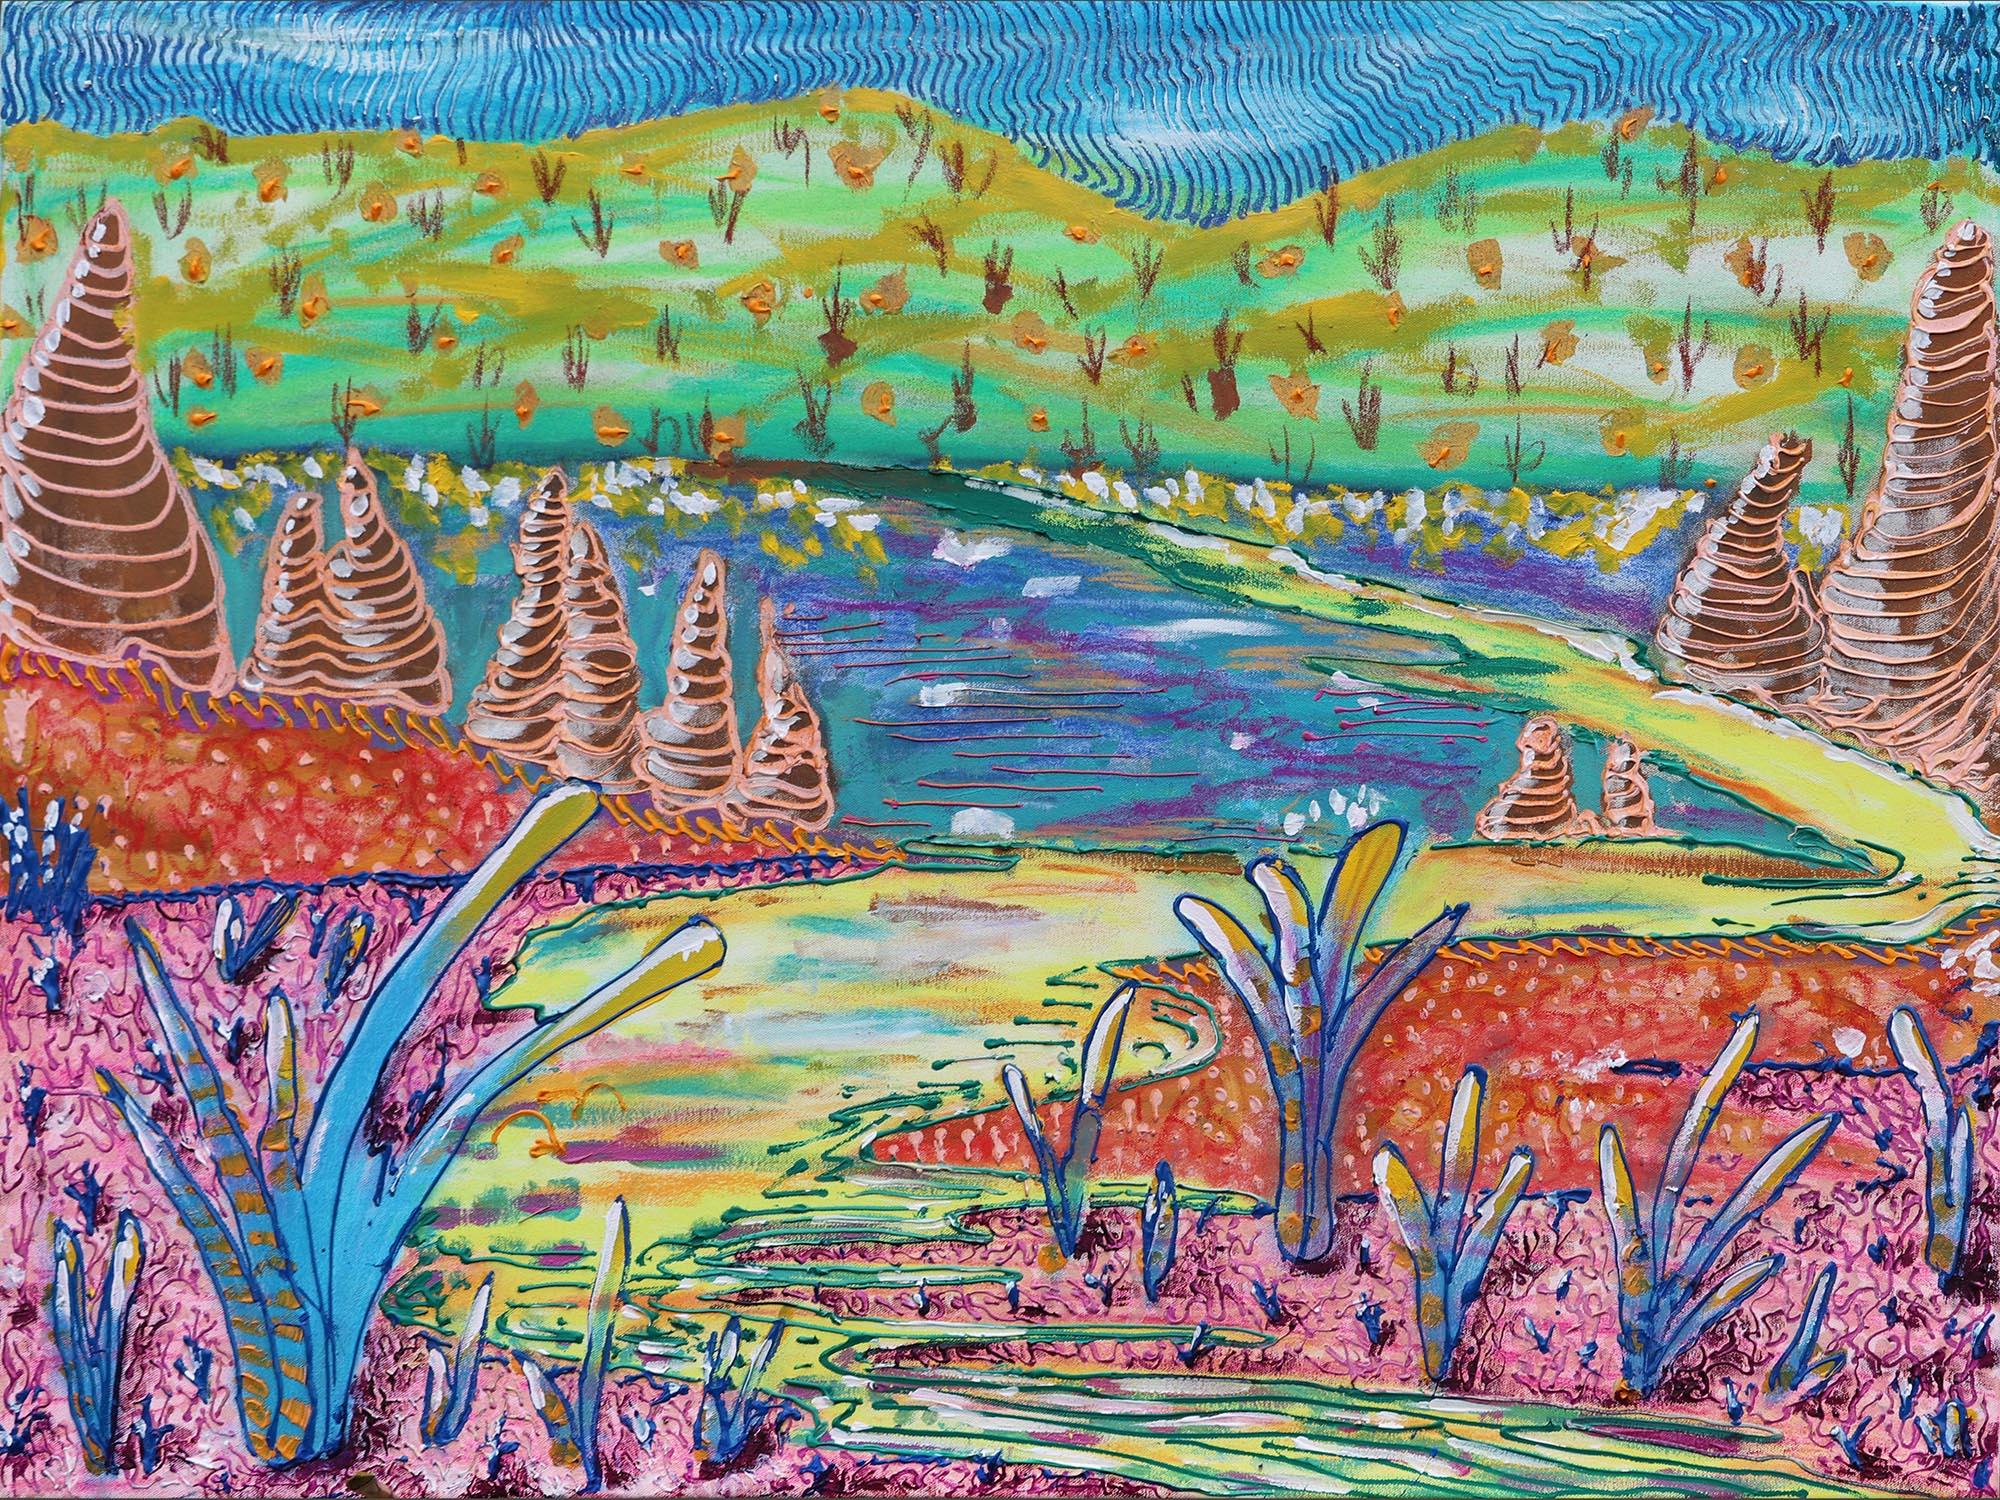 Christophe Riva, Land, Acrylic on Canvas, 75 x 100 cm,2019